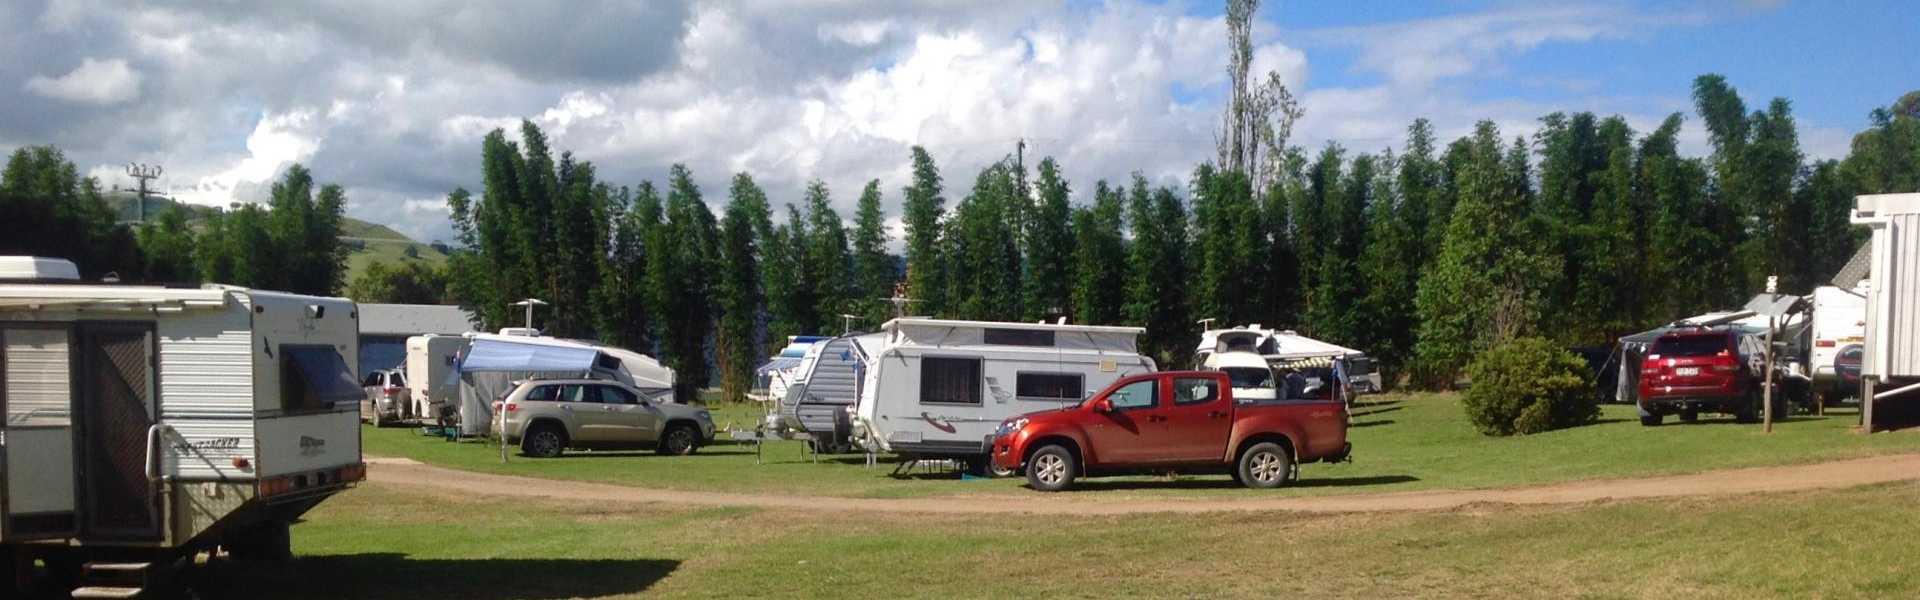 Kui Parks, Killarney Sundown Motel & Tourist Park, Sites